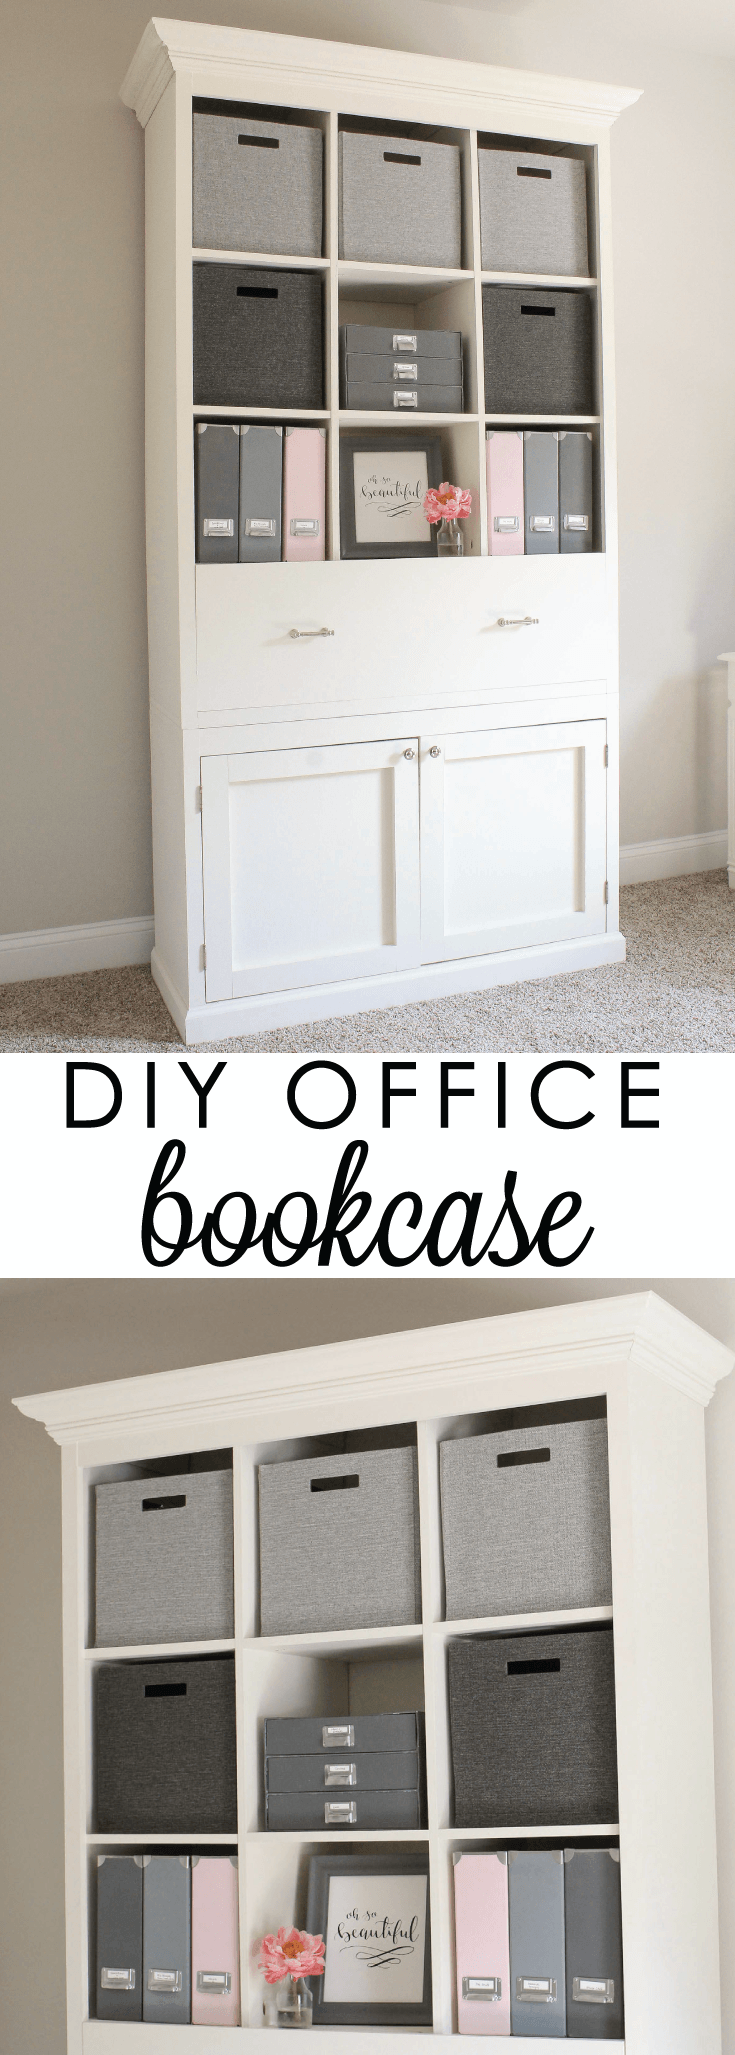 DIY Office Storage Cabinet Bookcase   Storage cabinets, Storage and ...